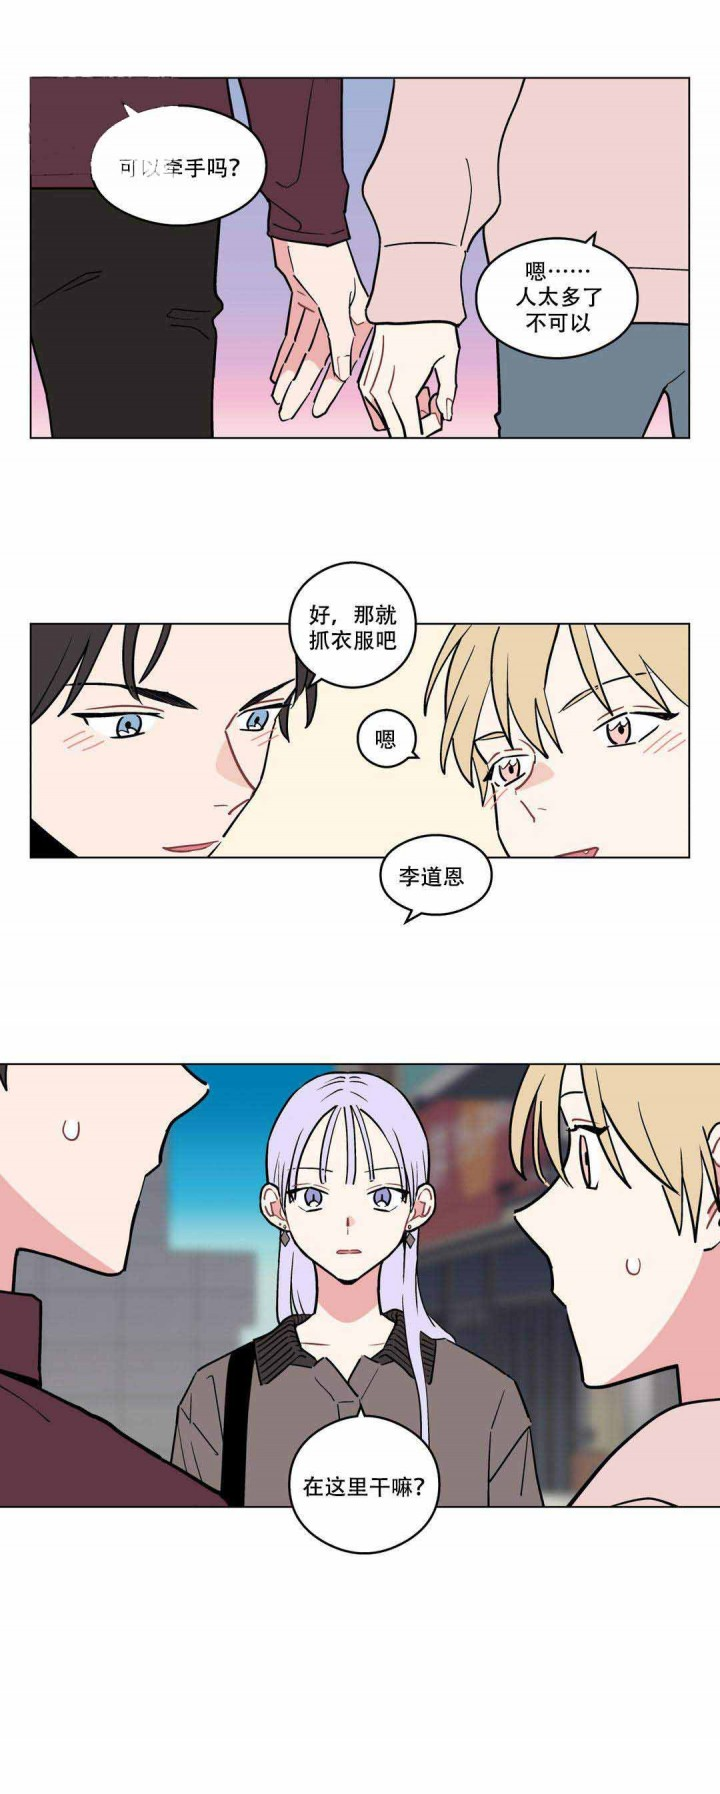 第11章-浪漫A